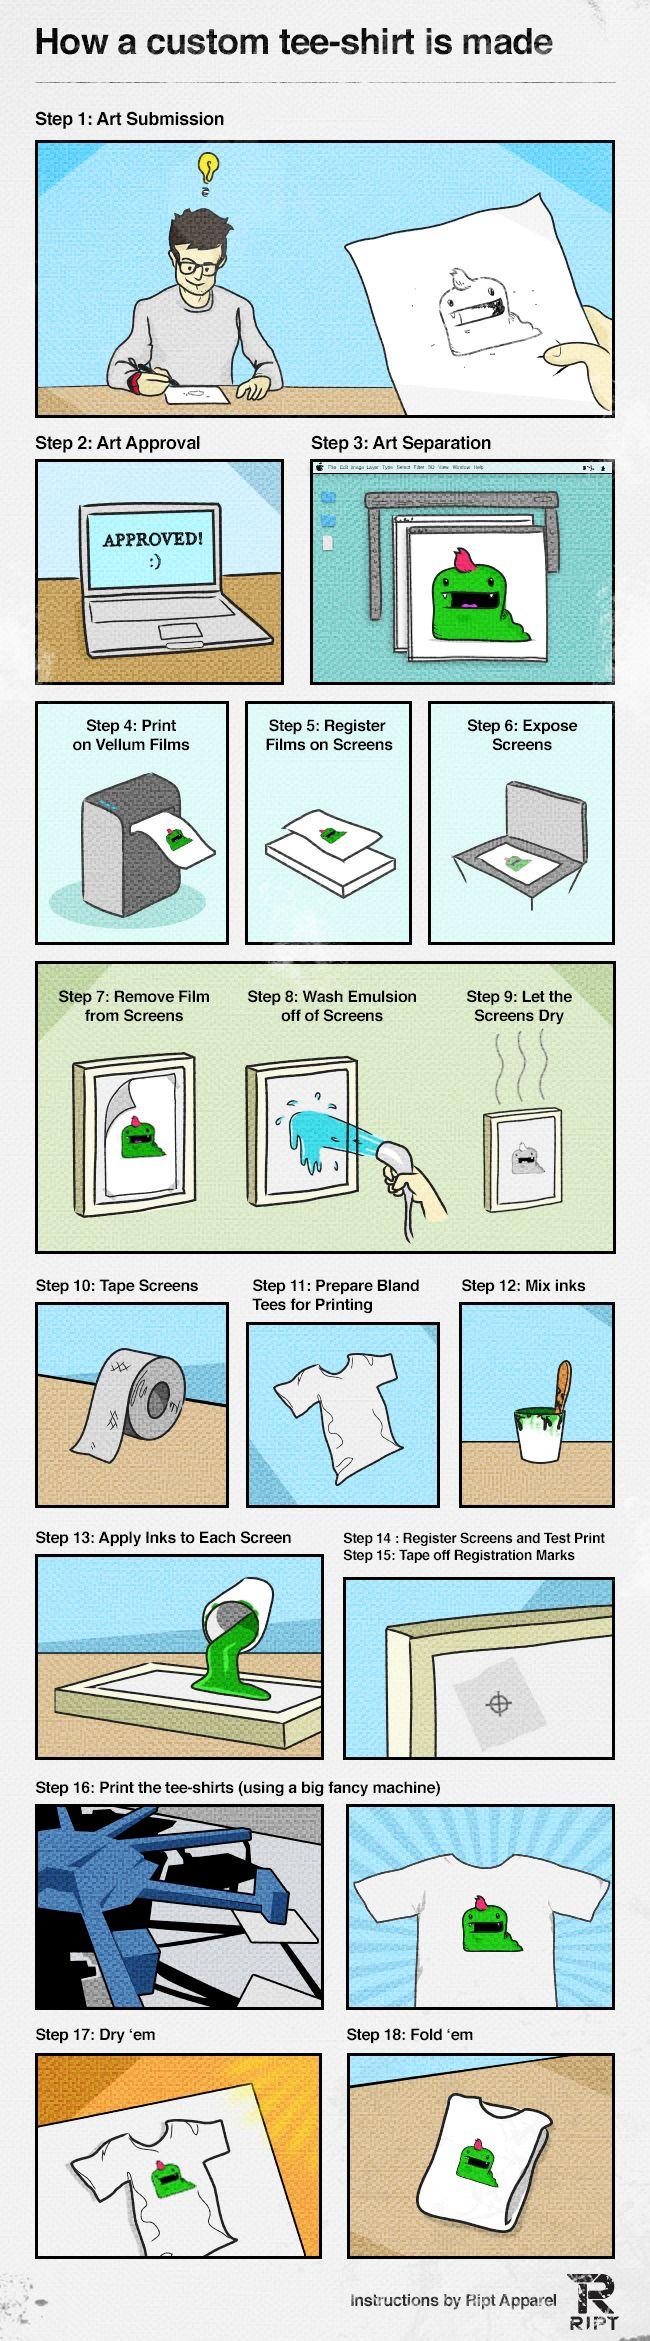 How A Custom T-Shirt Design Is Made http://www.bitrebels.com/design/custom-t-shirt-design-process/